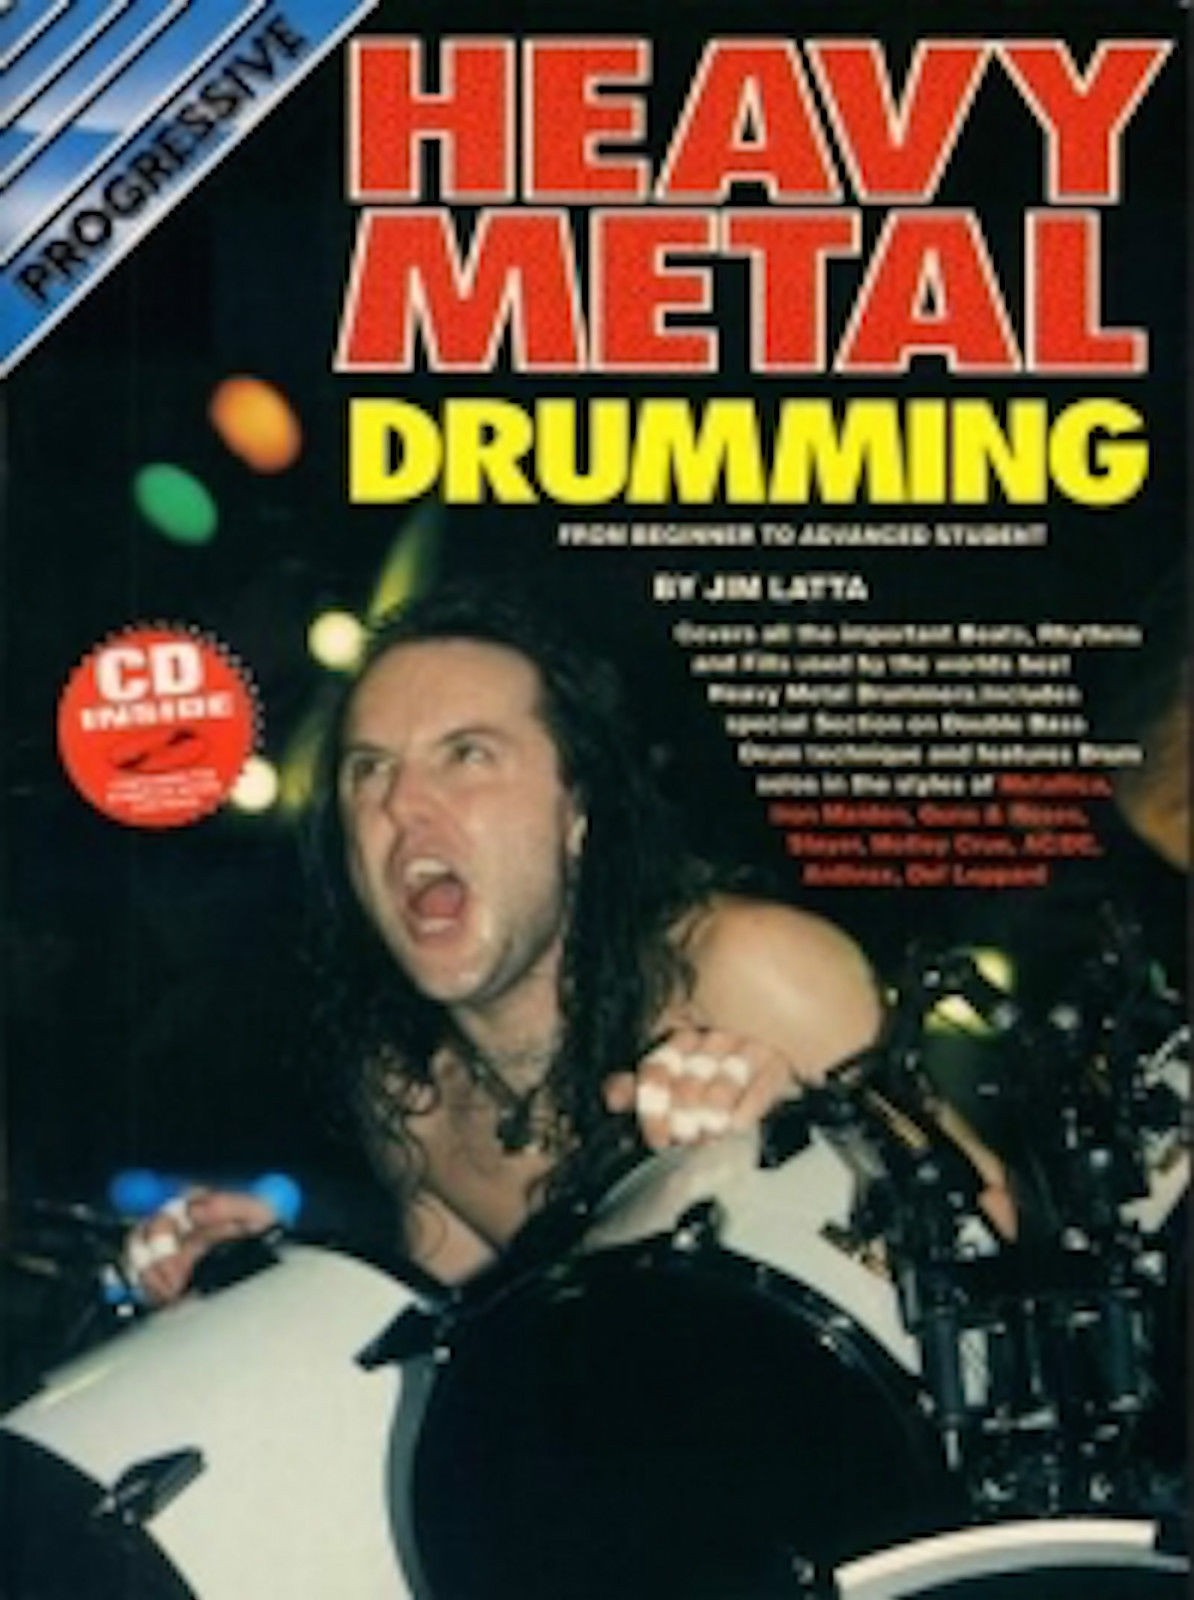 Progressive Heavy Metal Drumming Tutor Book Play Along CD Music Jim Latta B56